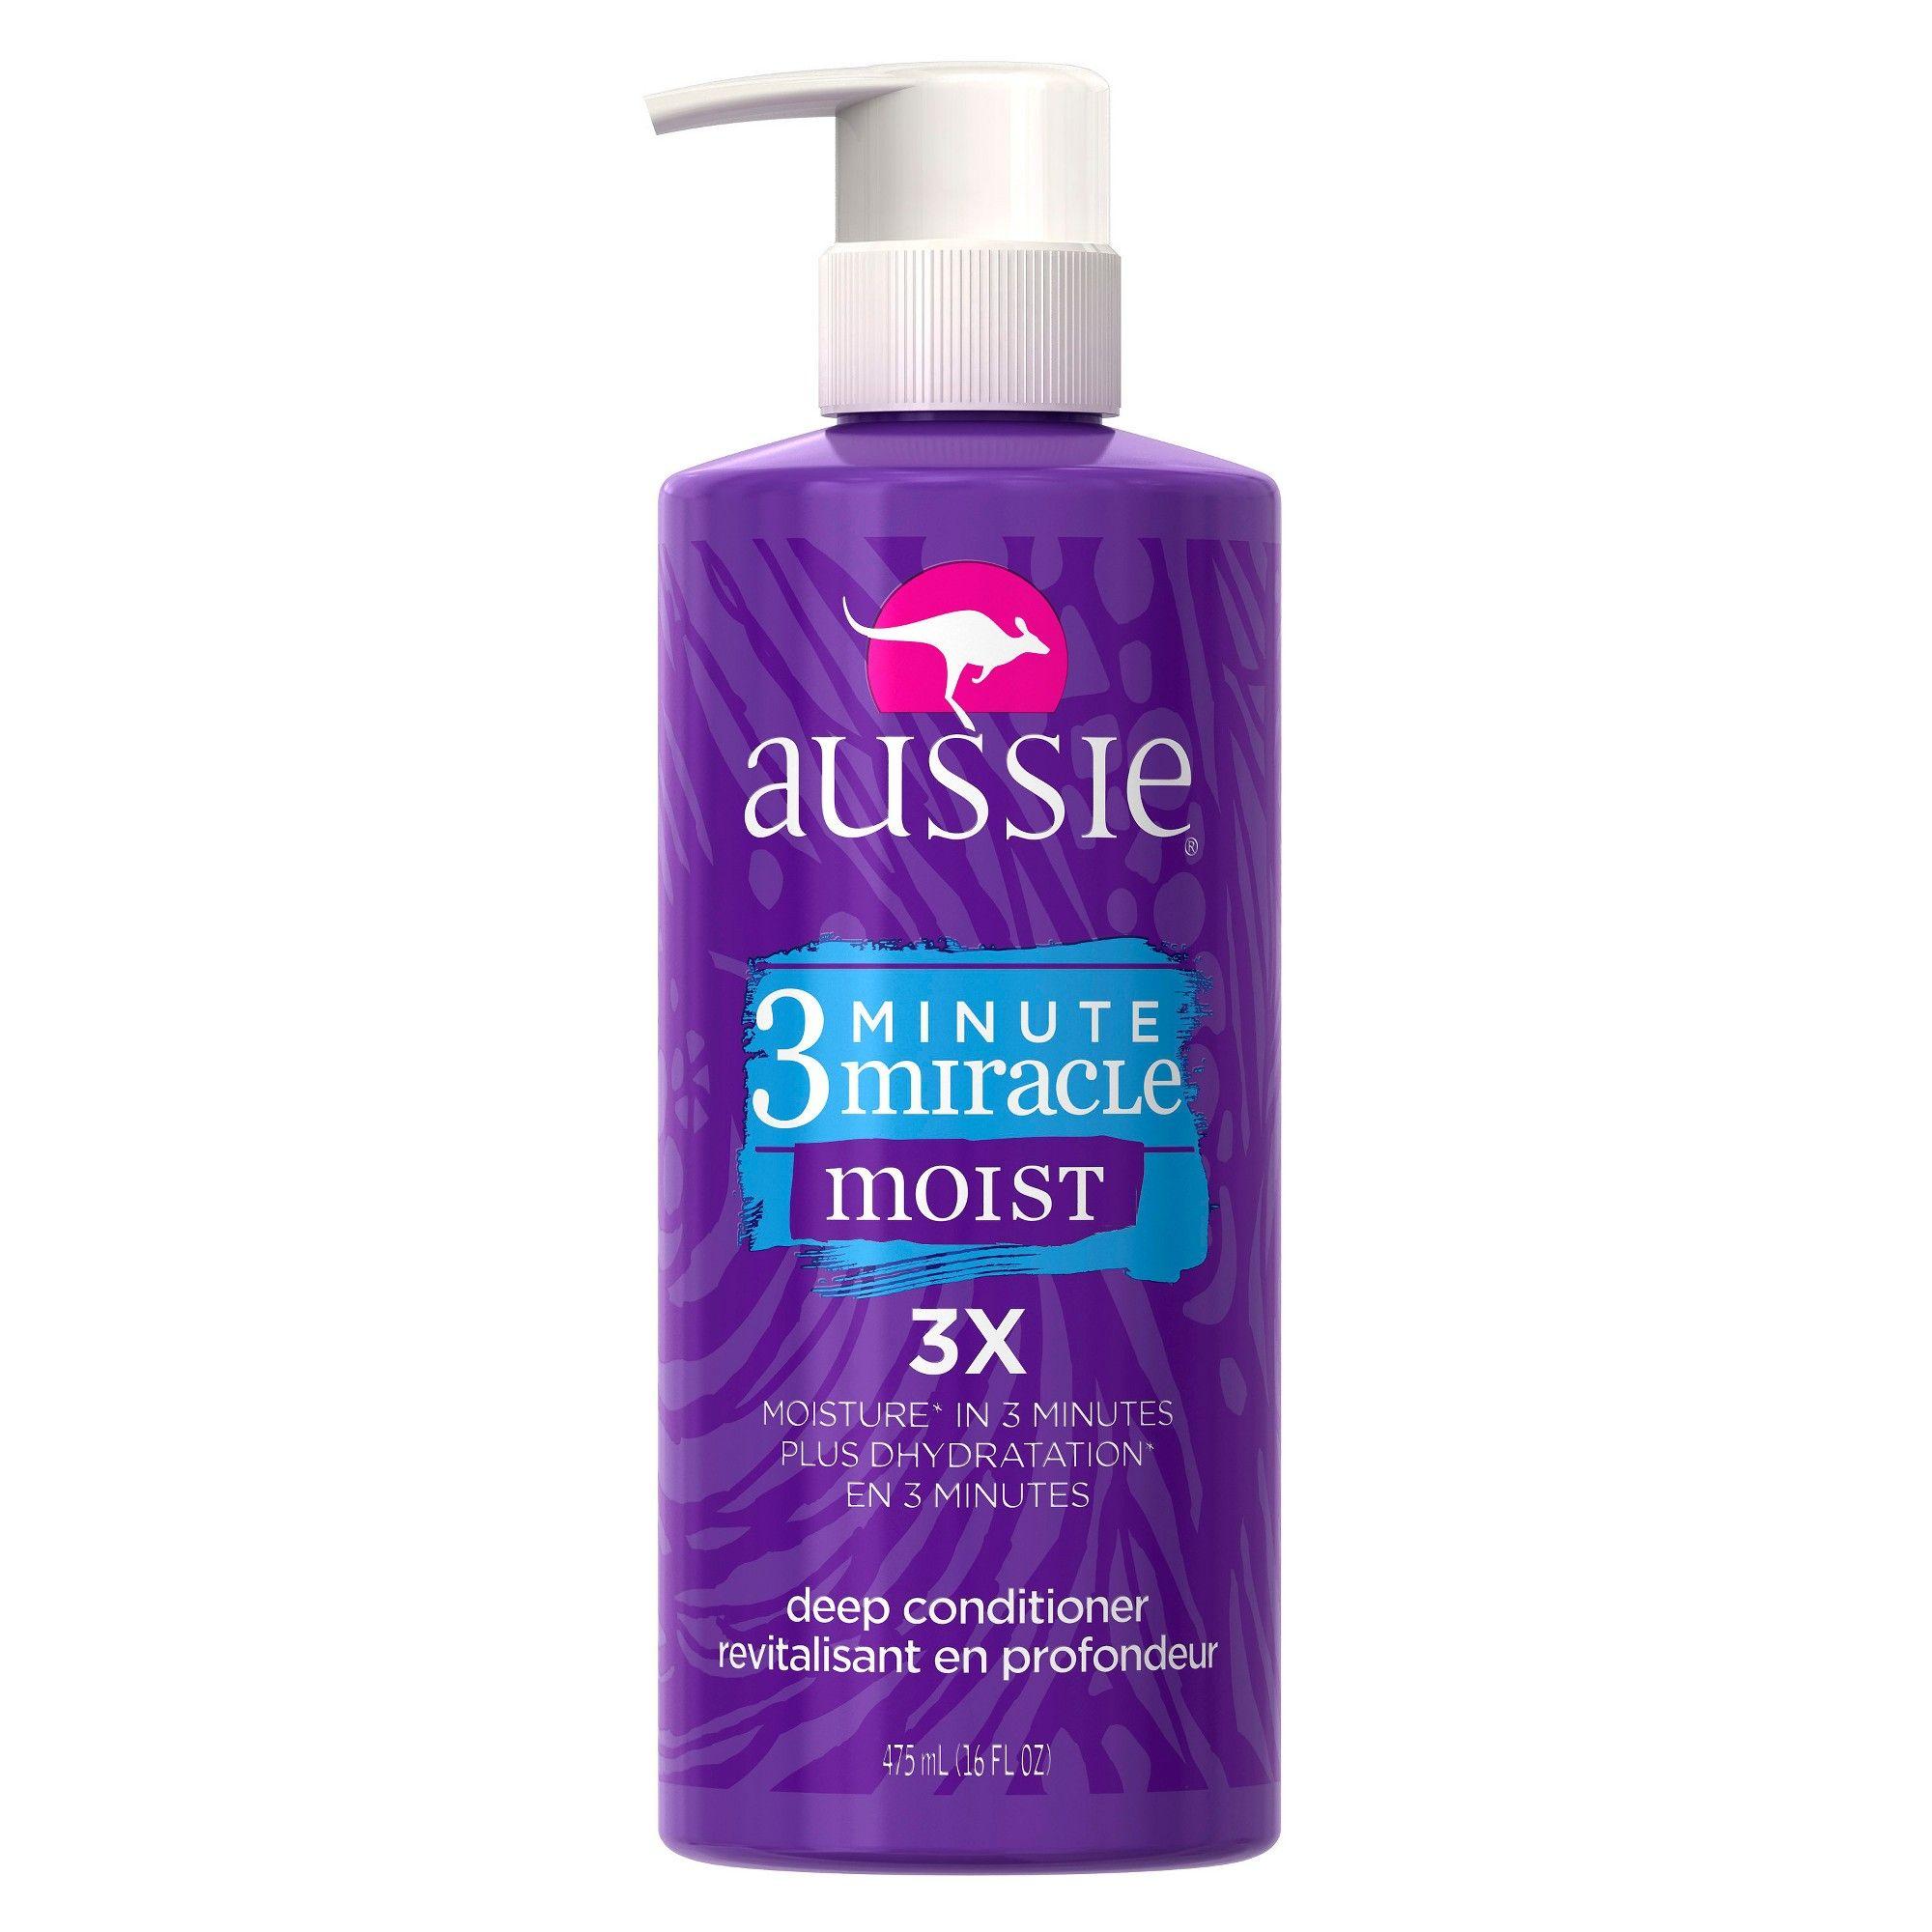 Aussie 3 Minute Miracle Moist Deep Conditioner 16oz